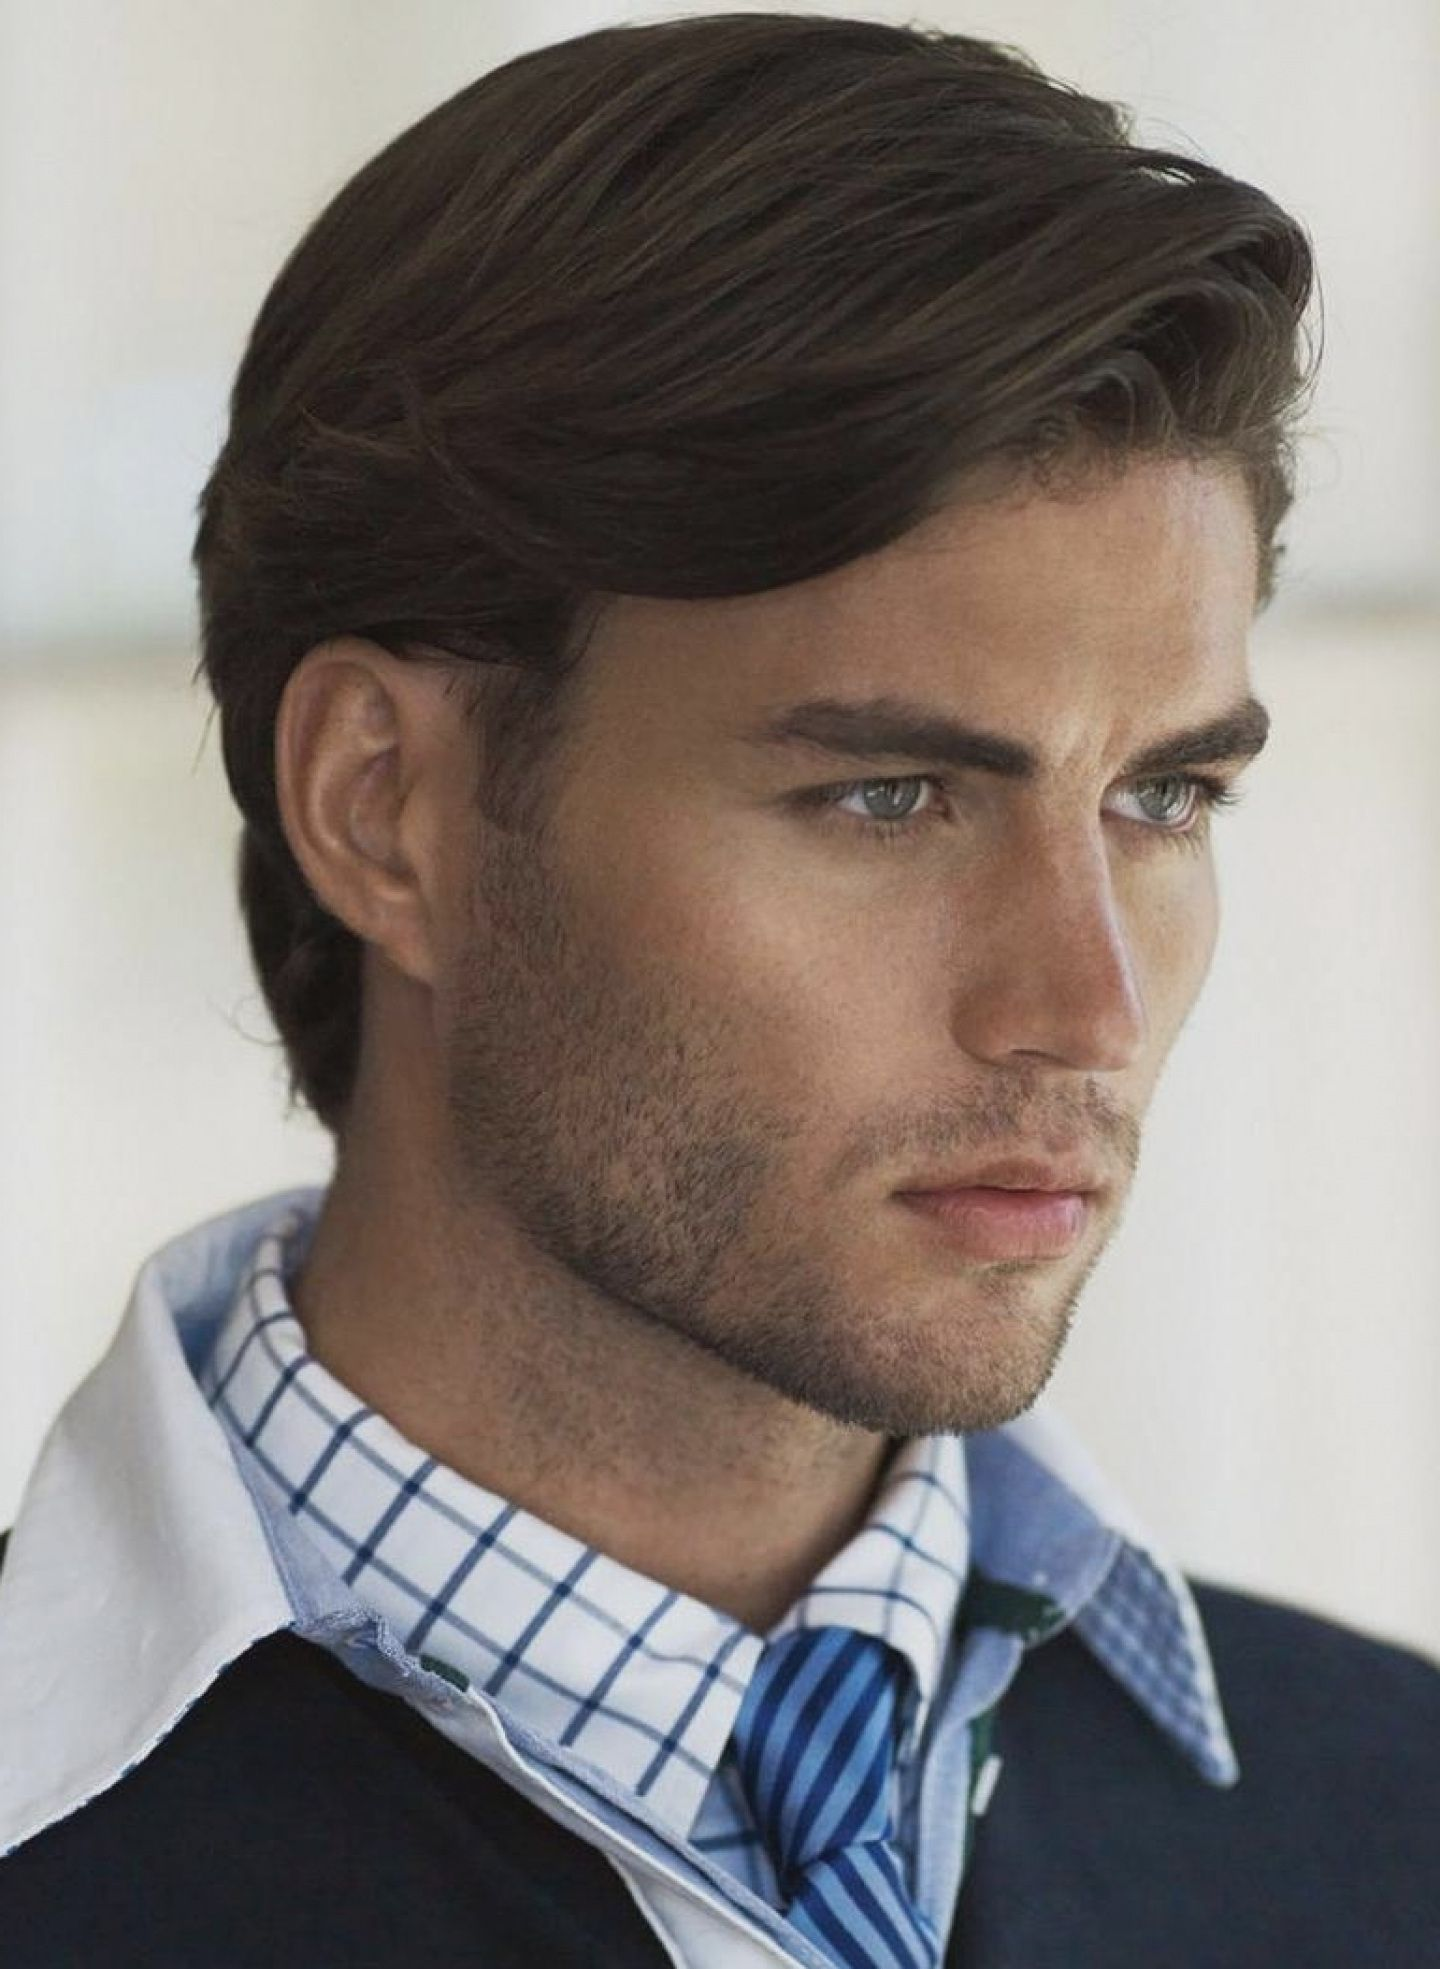 17 Super Cute Looks With Hairstyles Men Medium Lengths Mens Hairstyles Medium Mens Hairstyles Wavy Hairstyles Medium